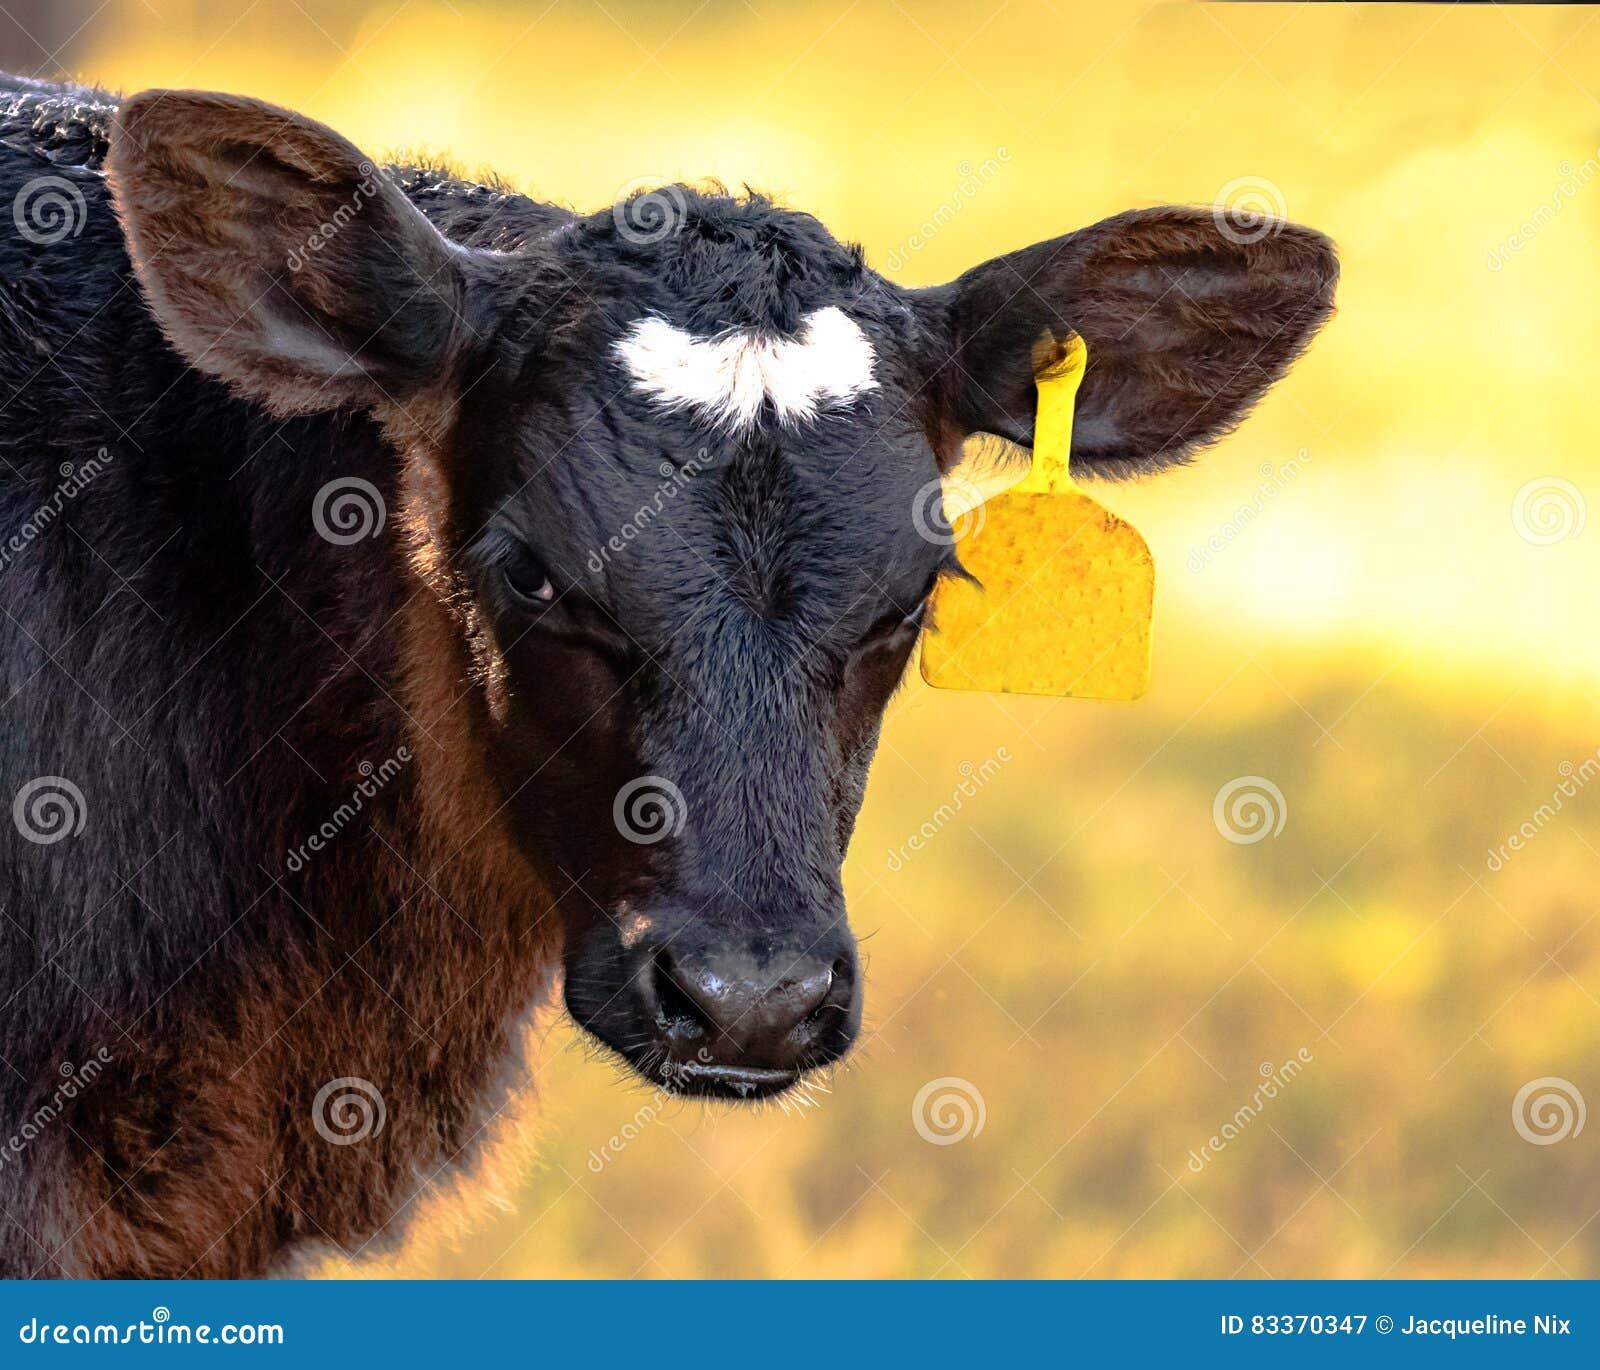 Angus crossbred calf head and neck